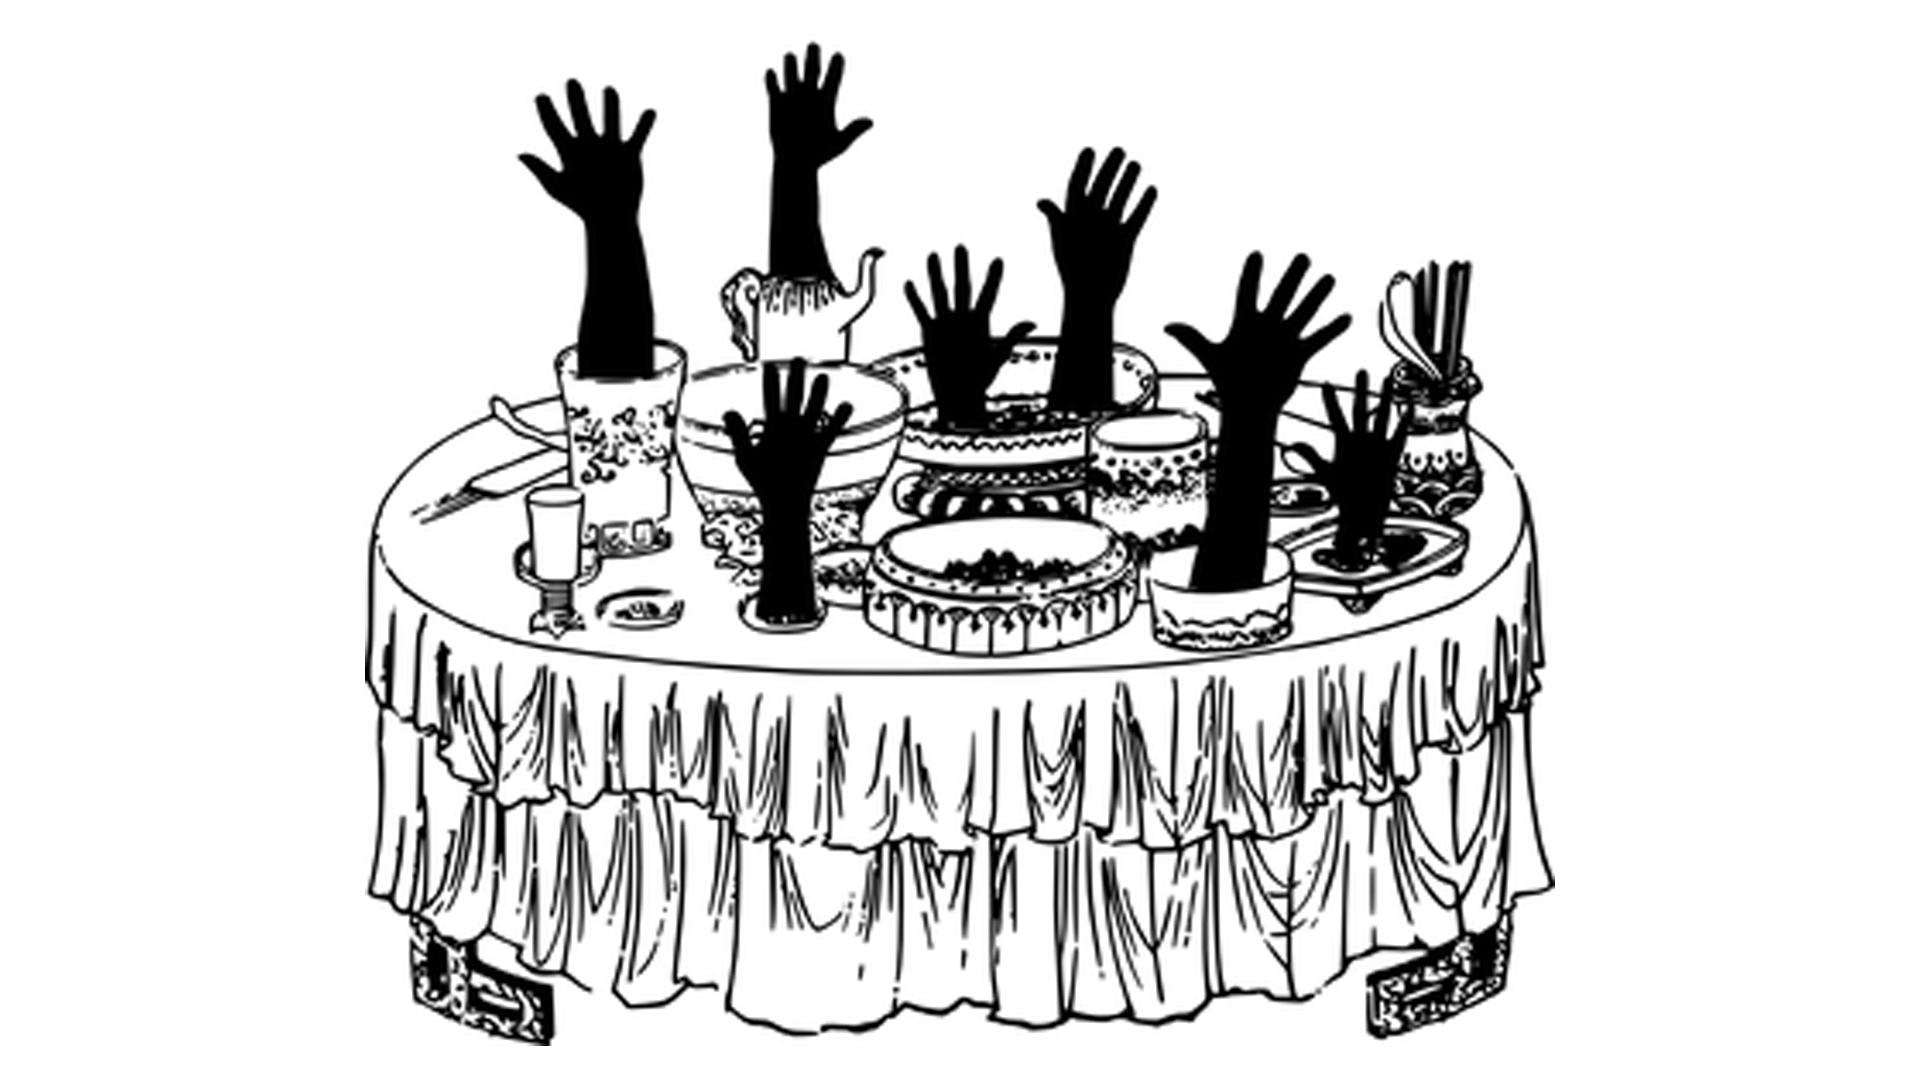 Motel Spooky-Nine artwork